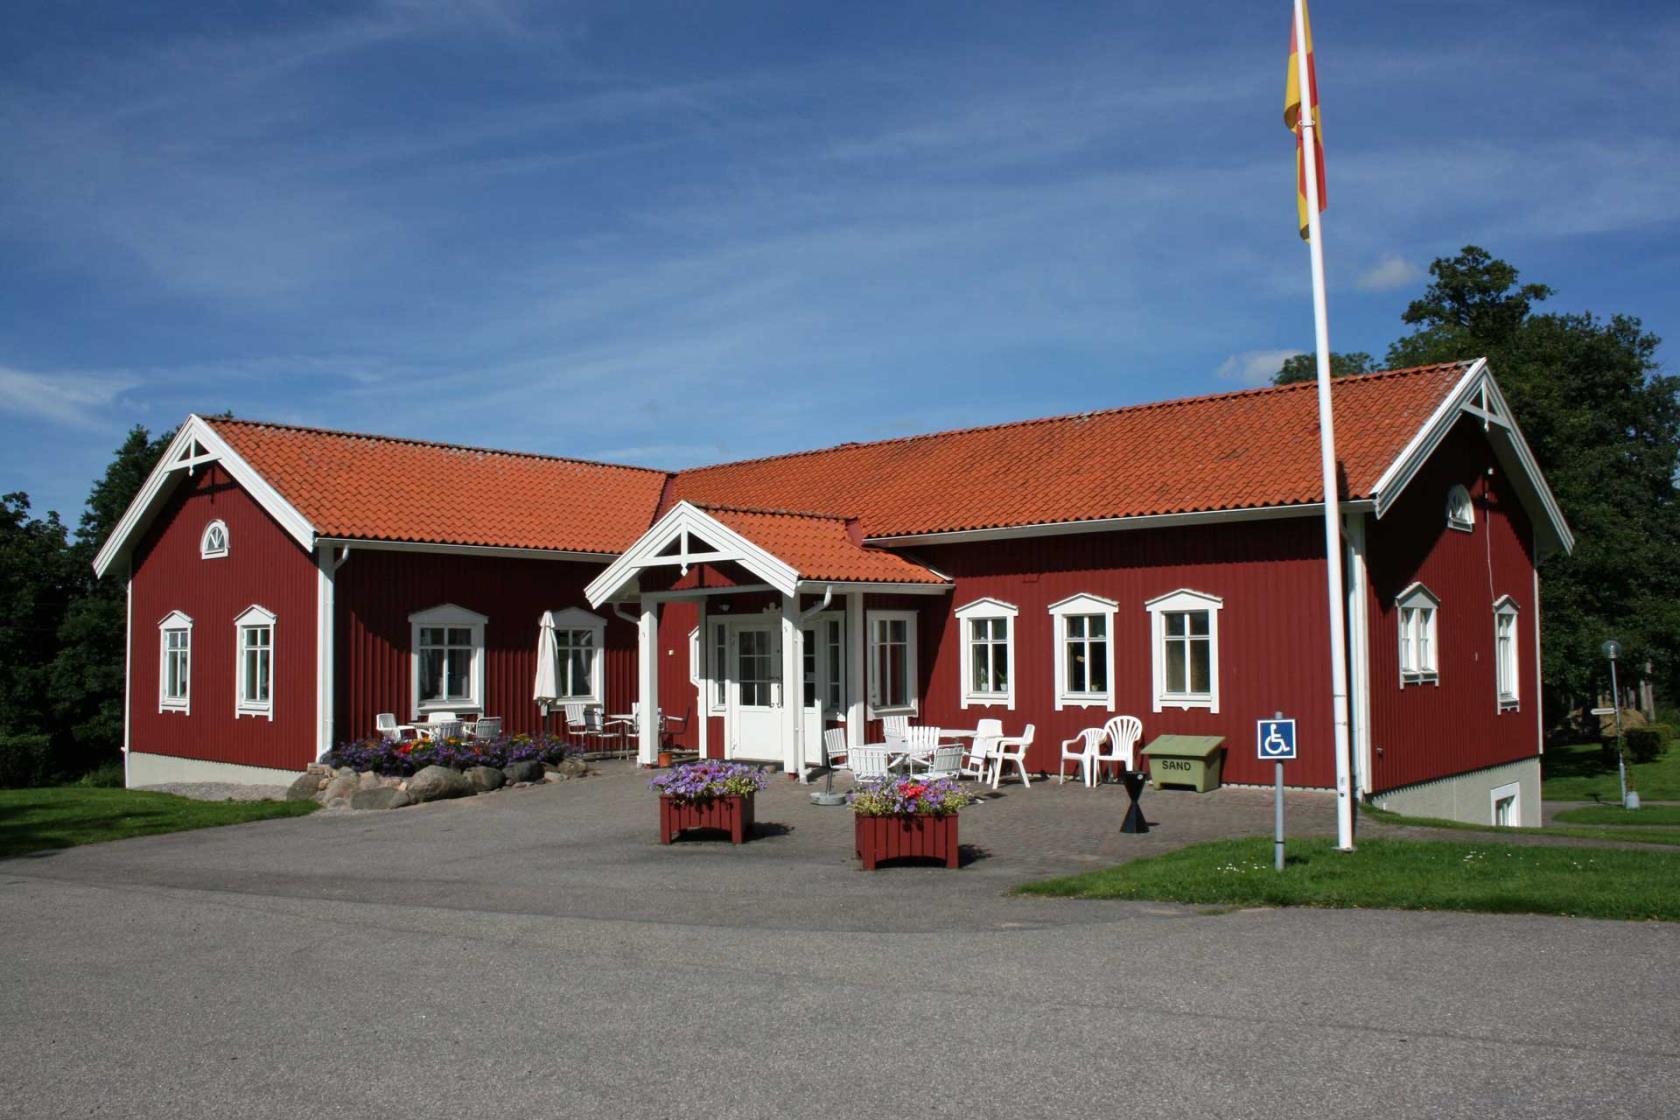 enköping dating sites blomstermåla dating site